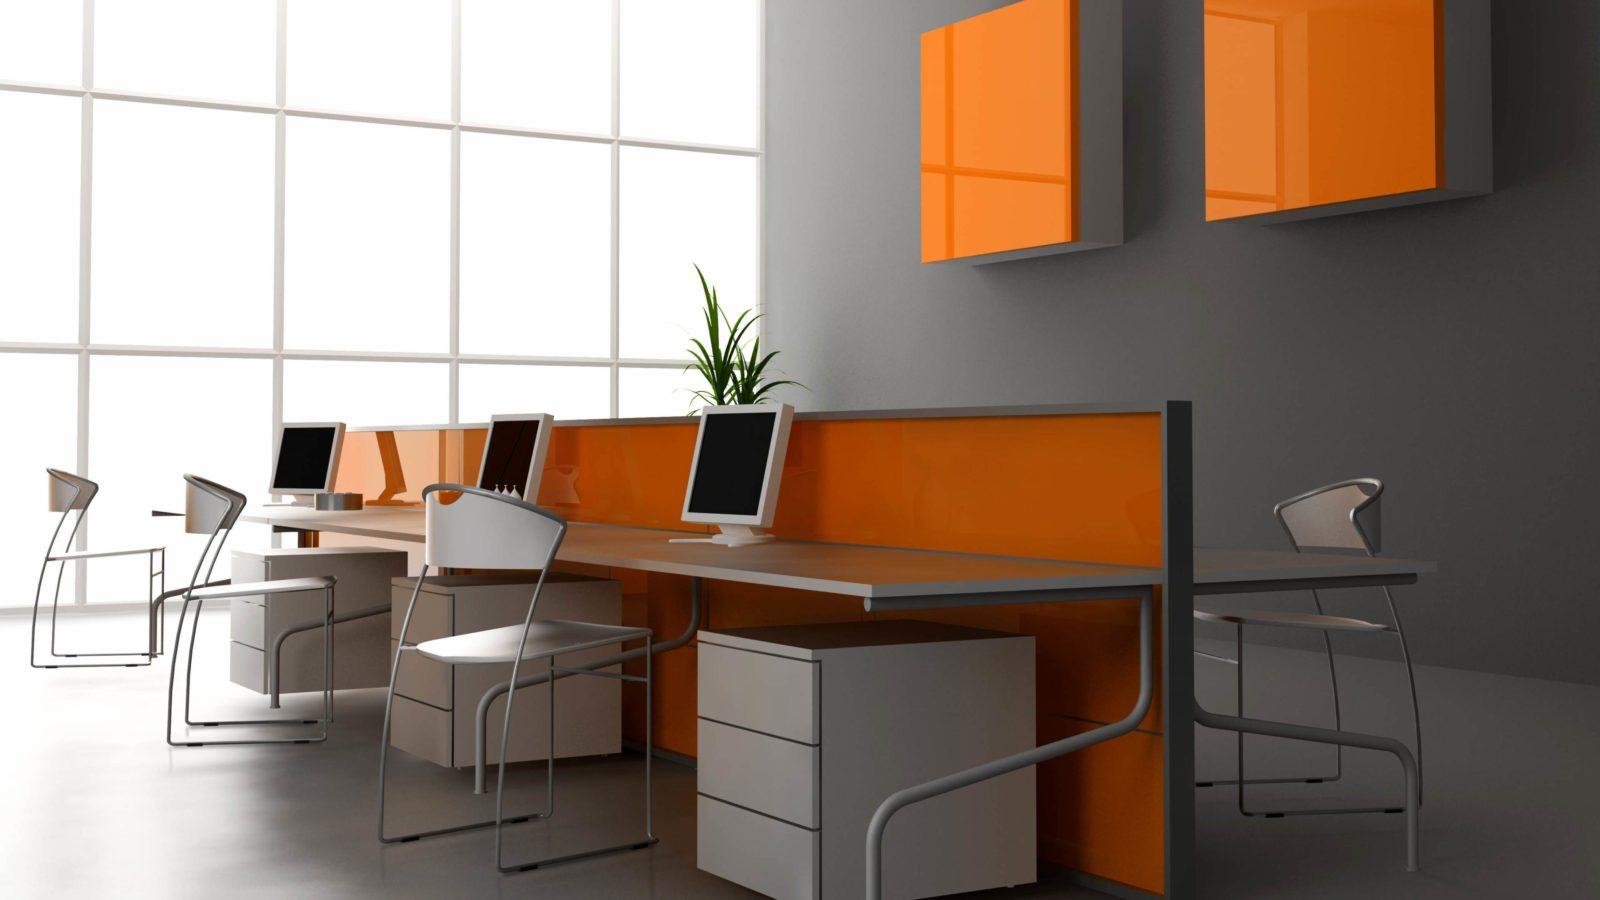 [:ua]Як скласти кошторис на меблі[:ru]Как составить смету на мебель[:]